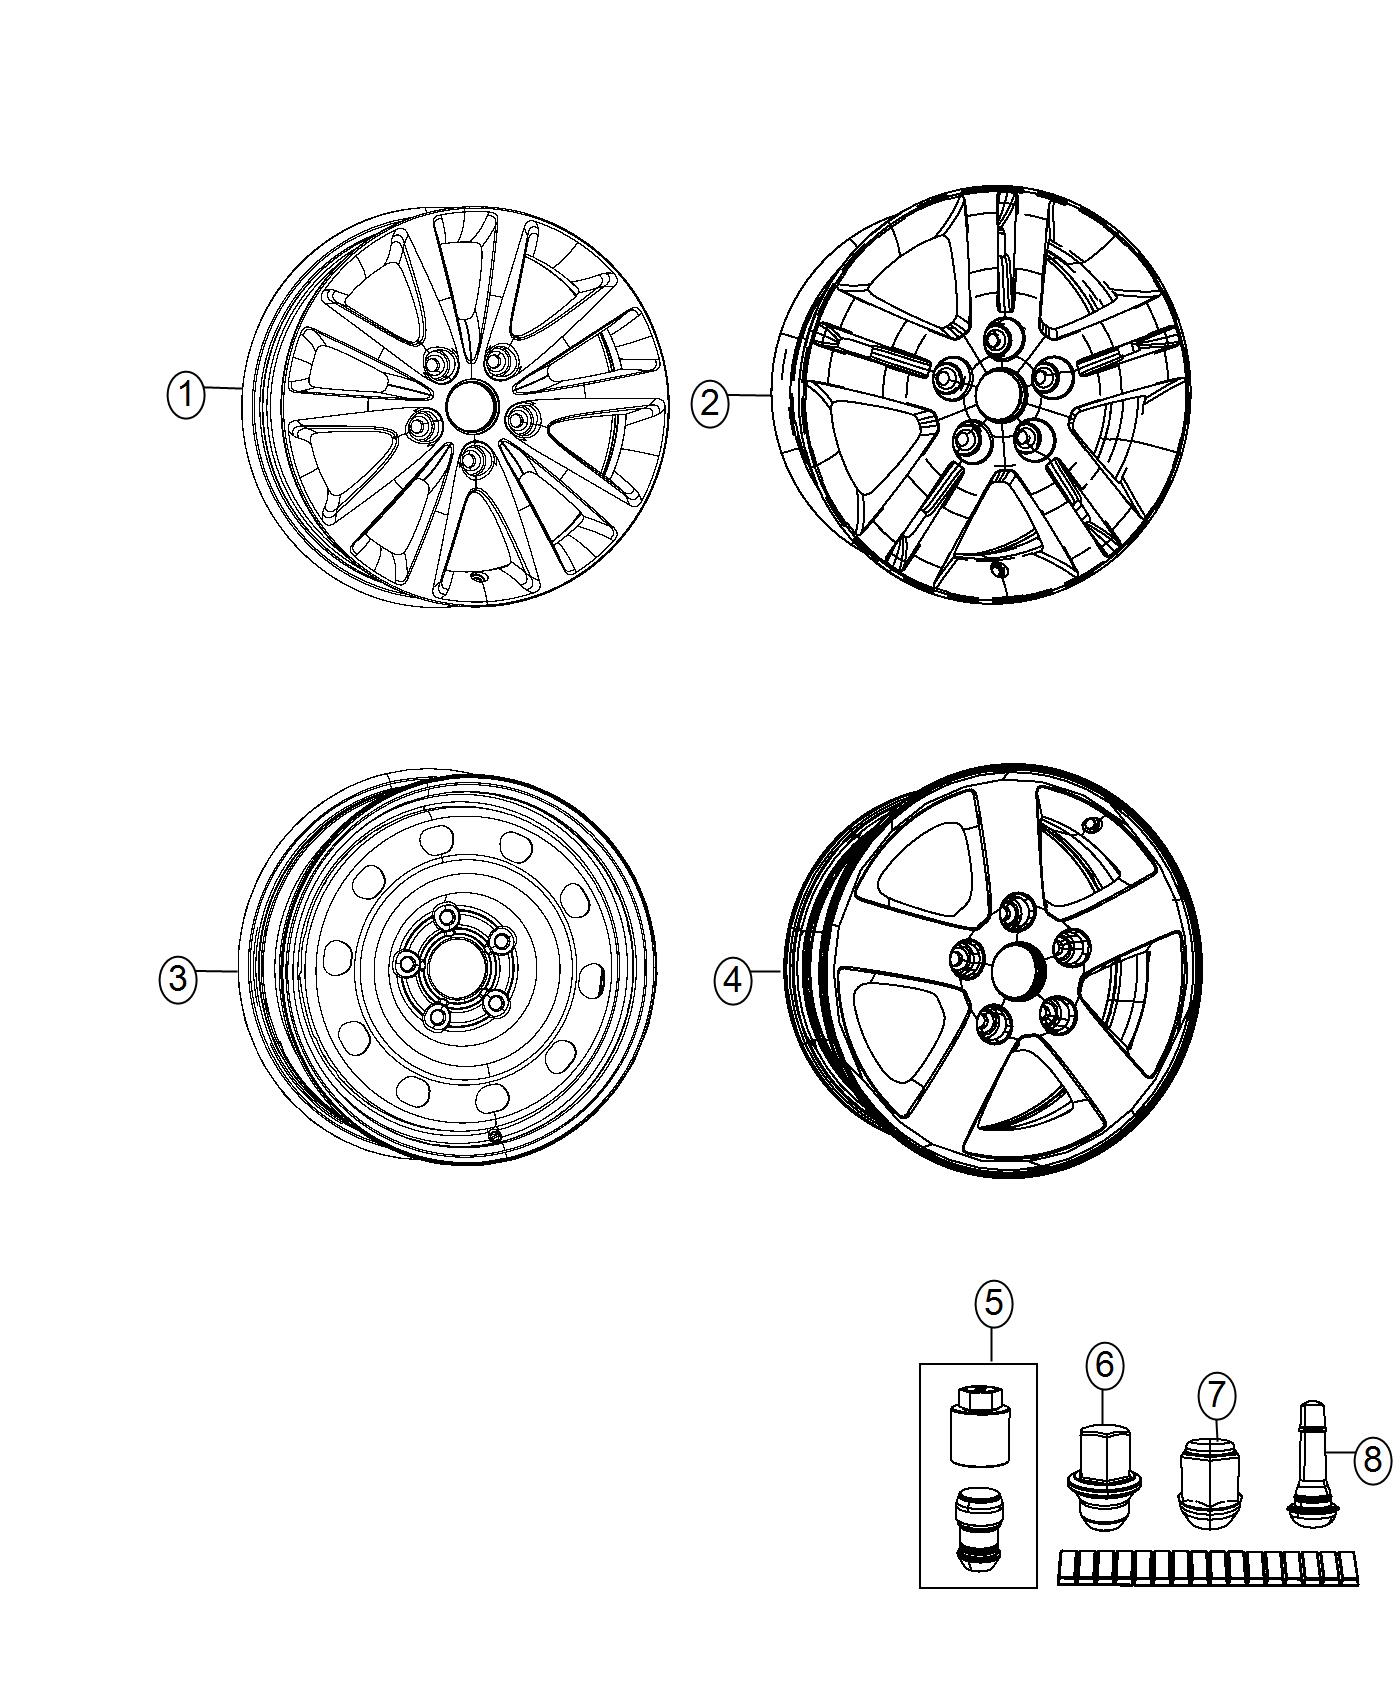 2017 Dodge Grand Caravan Wheel. Aluminum. Front or rear